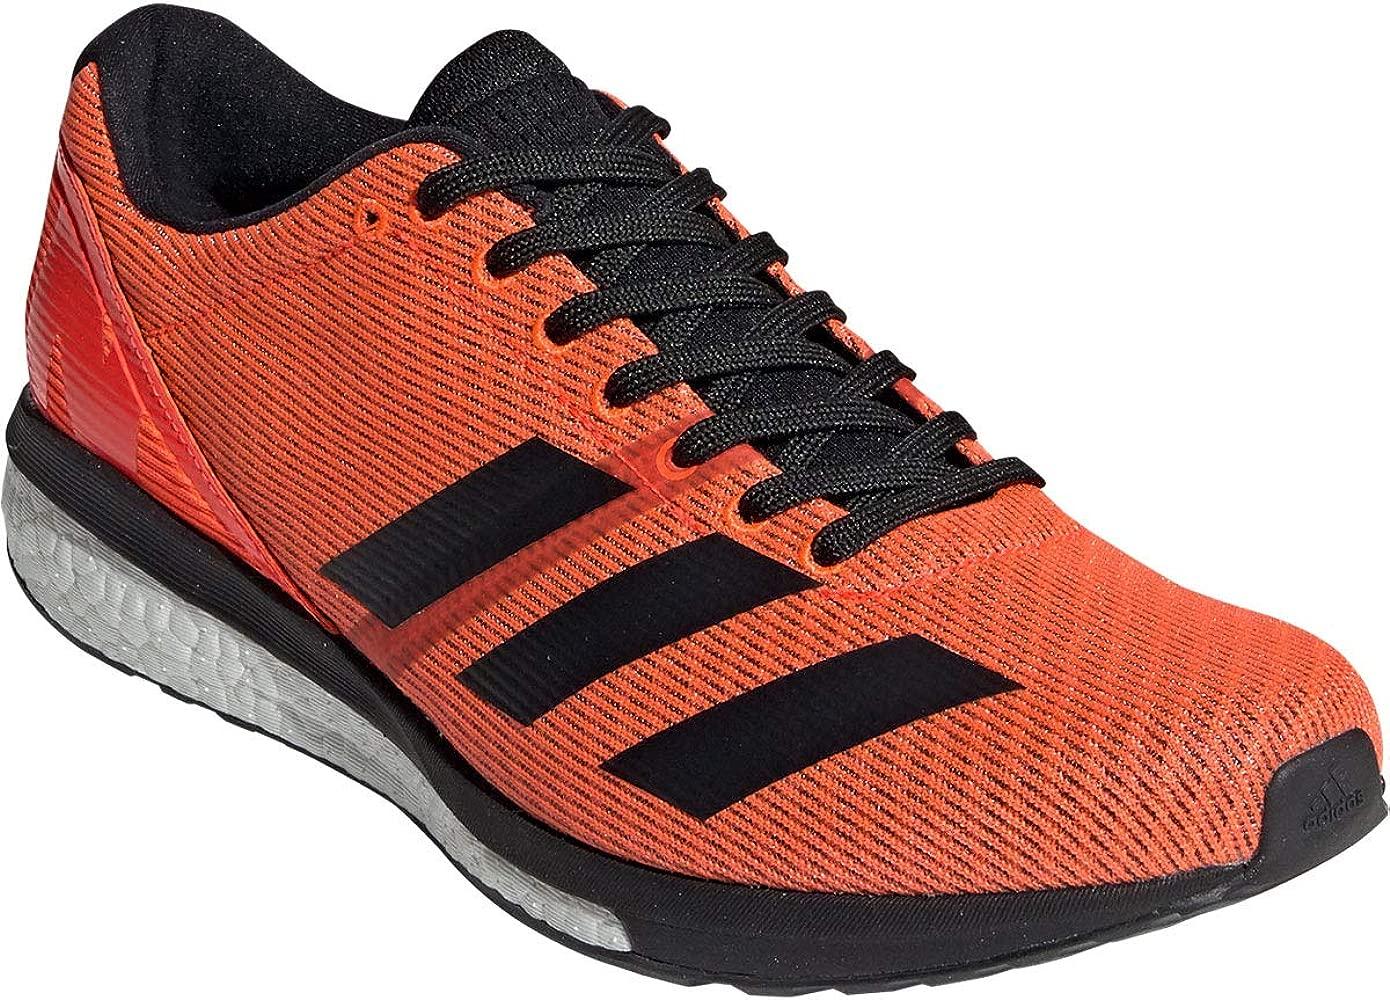 2zapatillas running hombre adidas boston